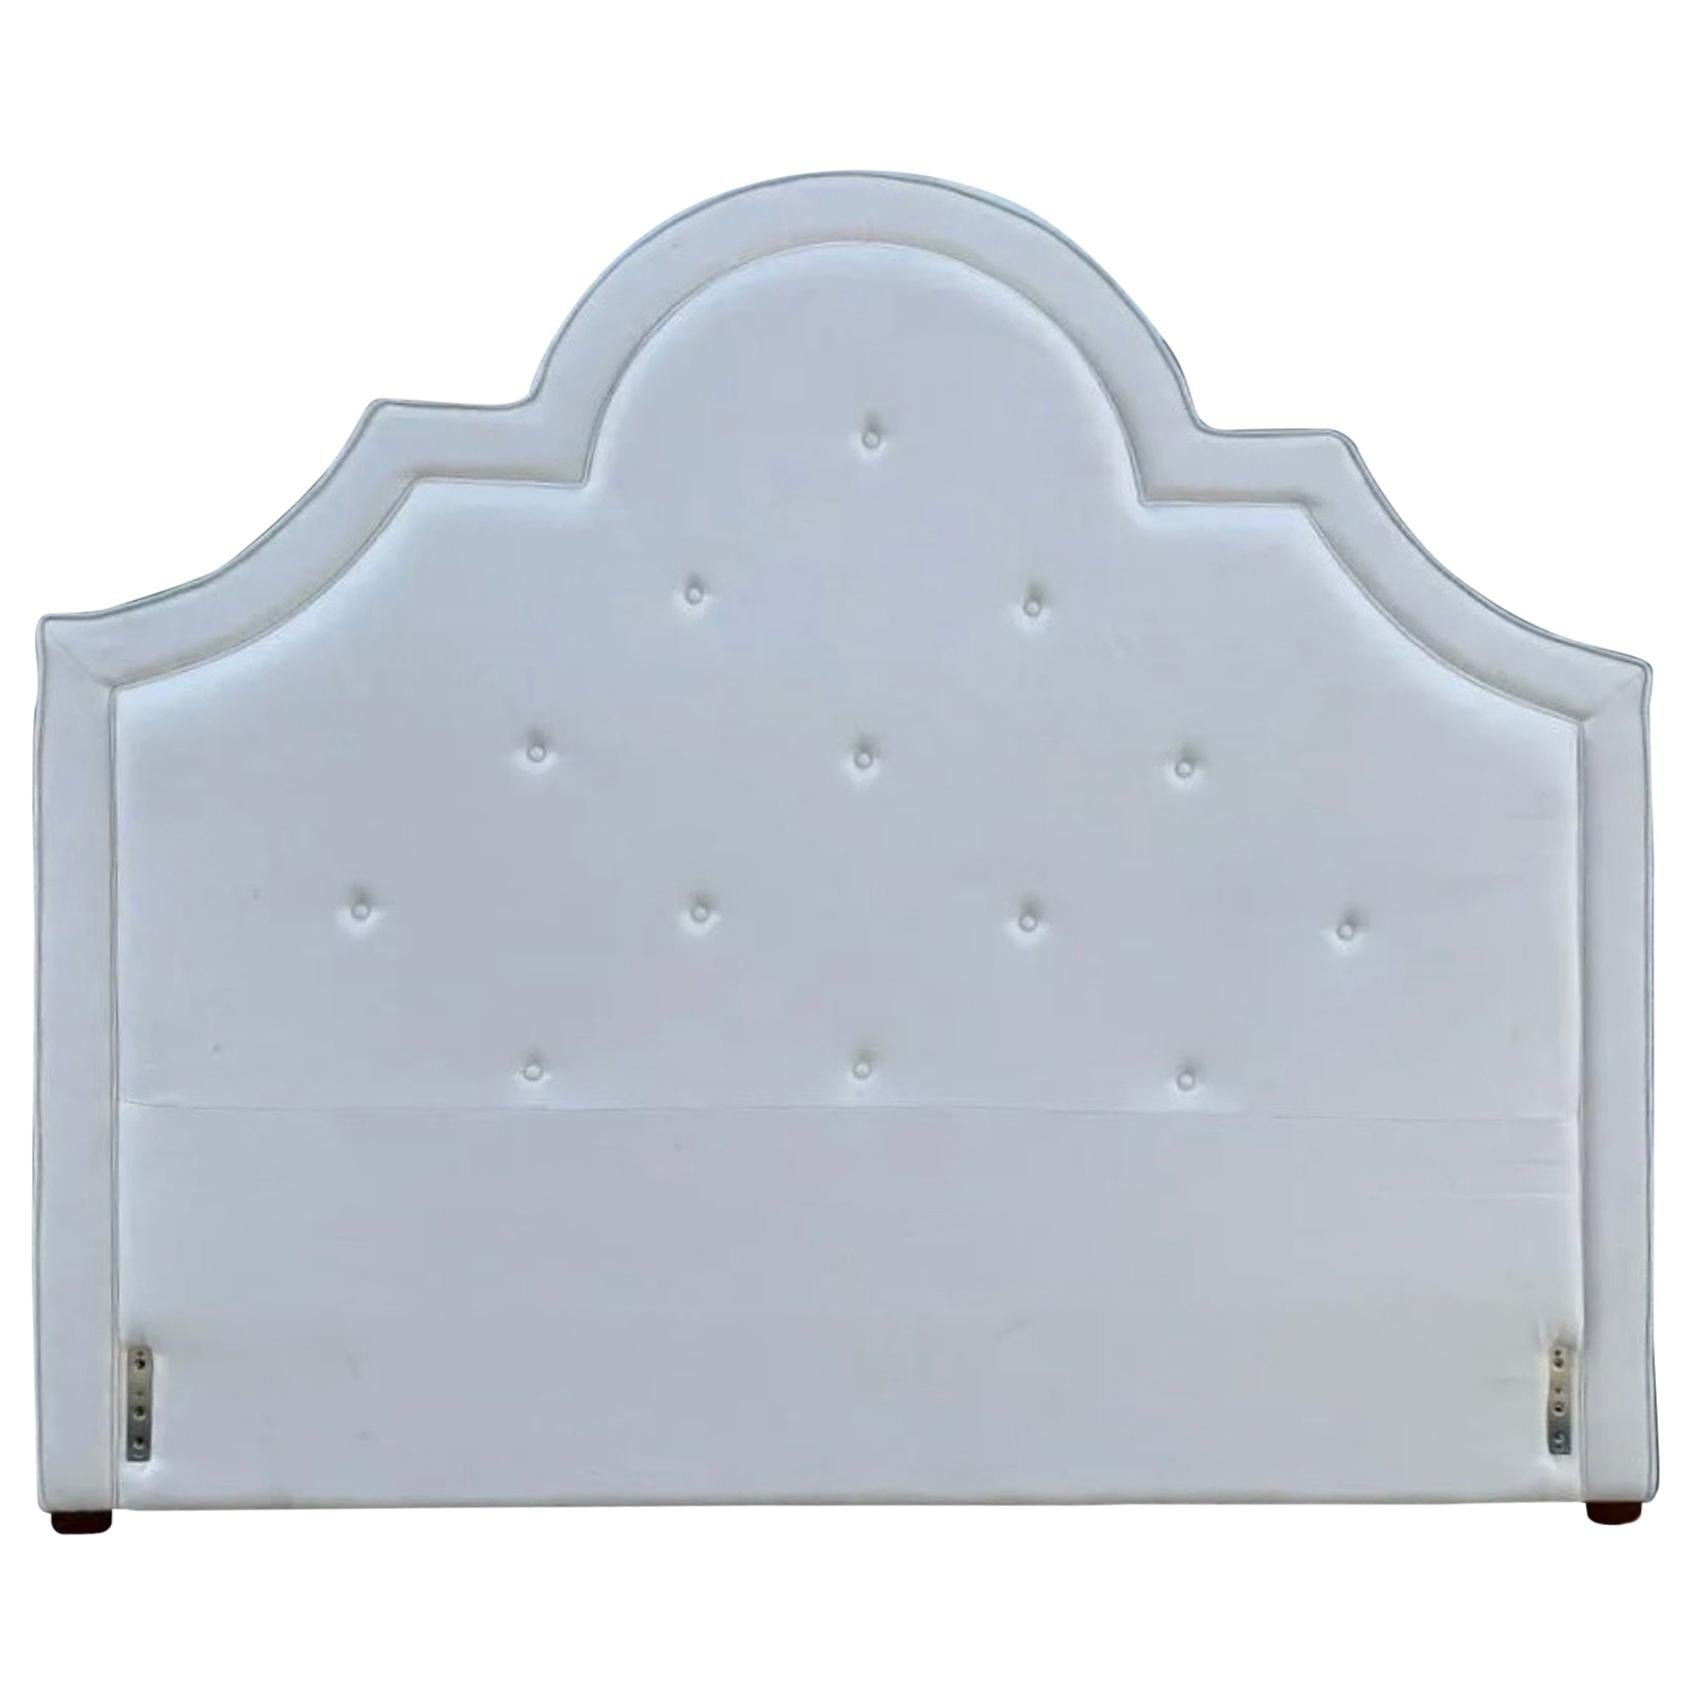 King Tufted Upholstered Headboard